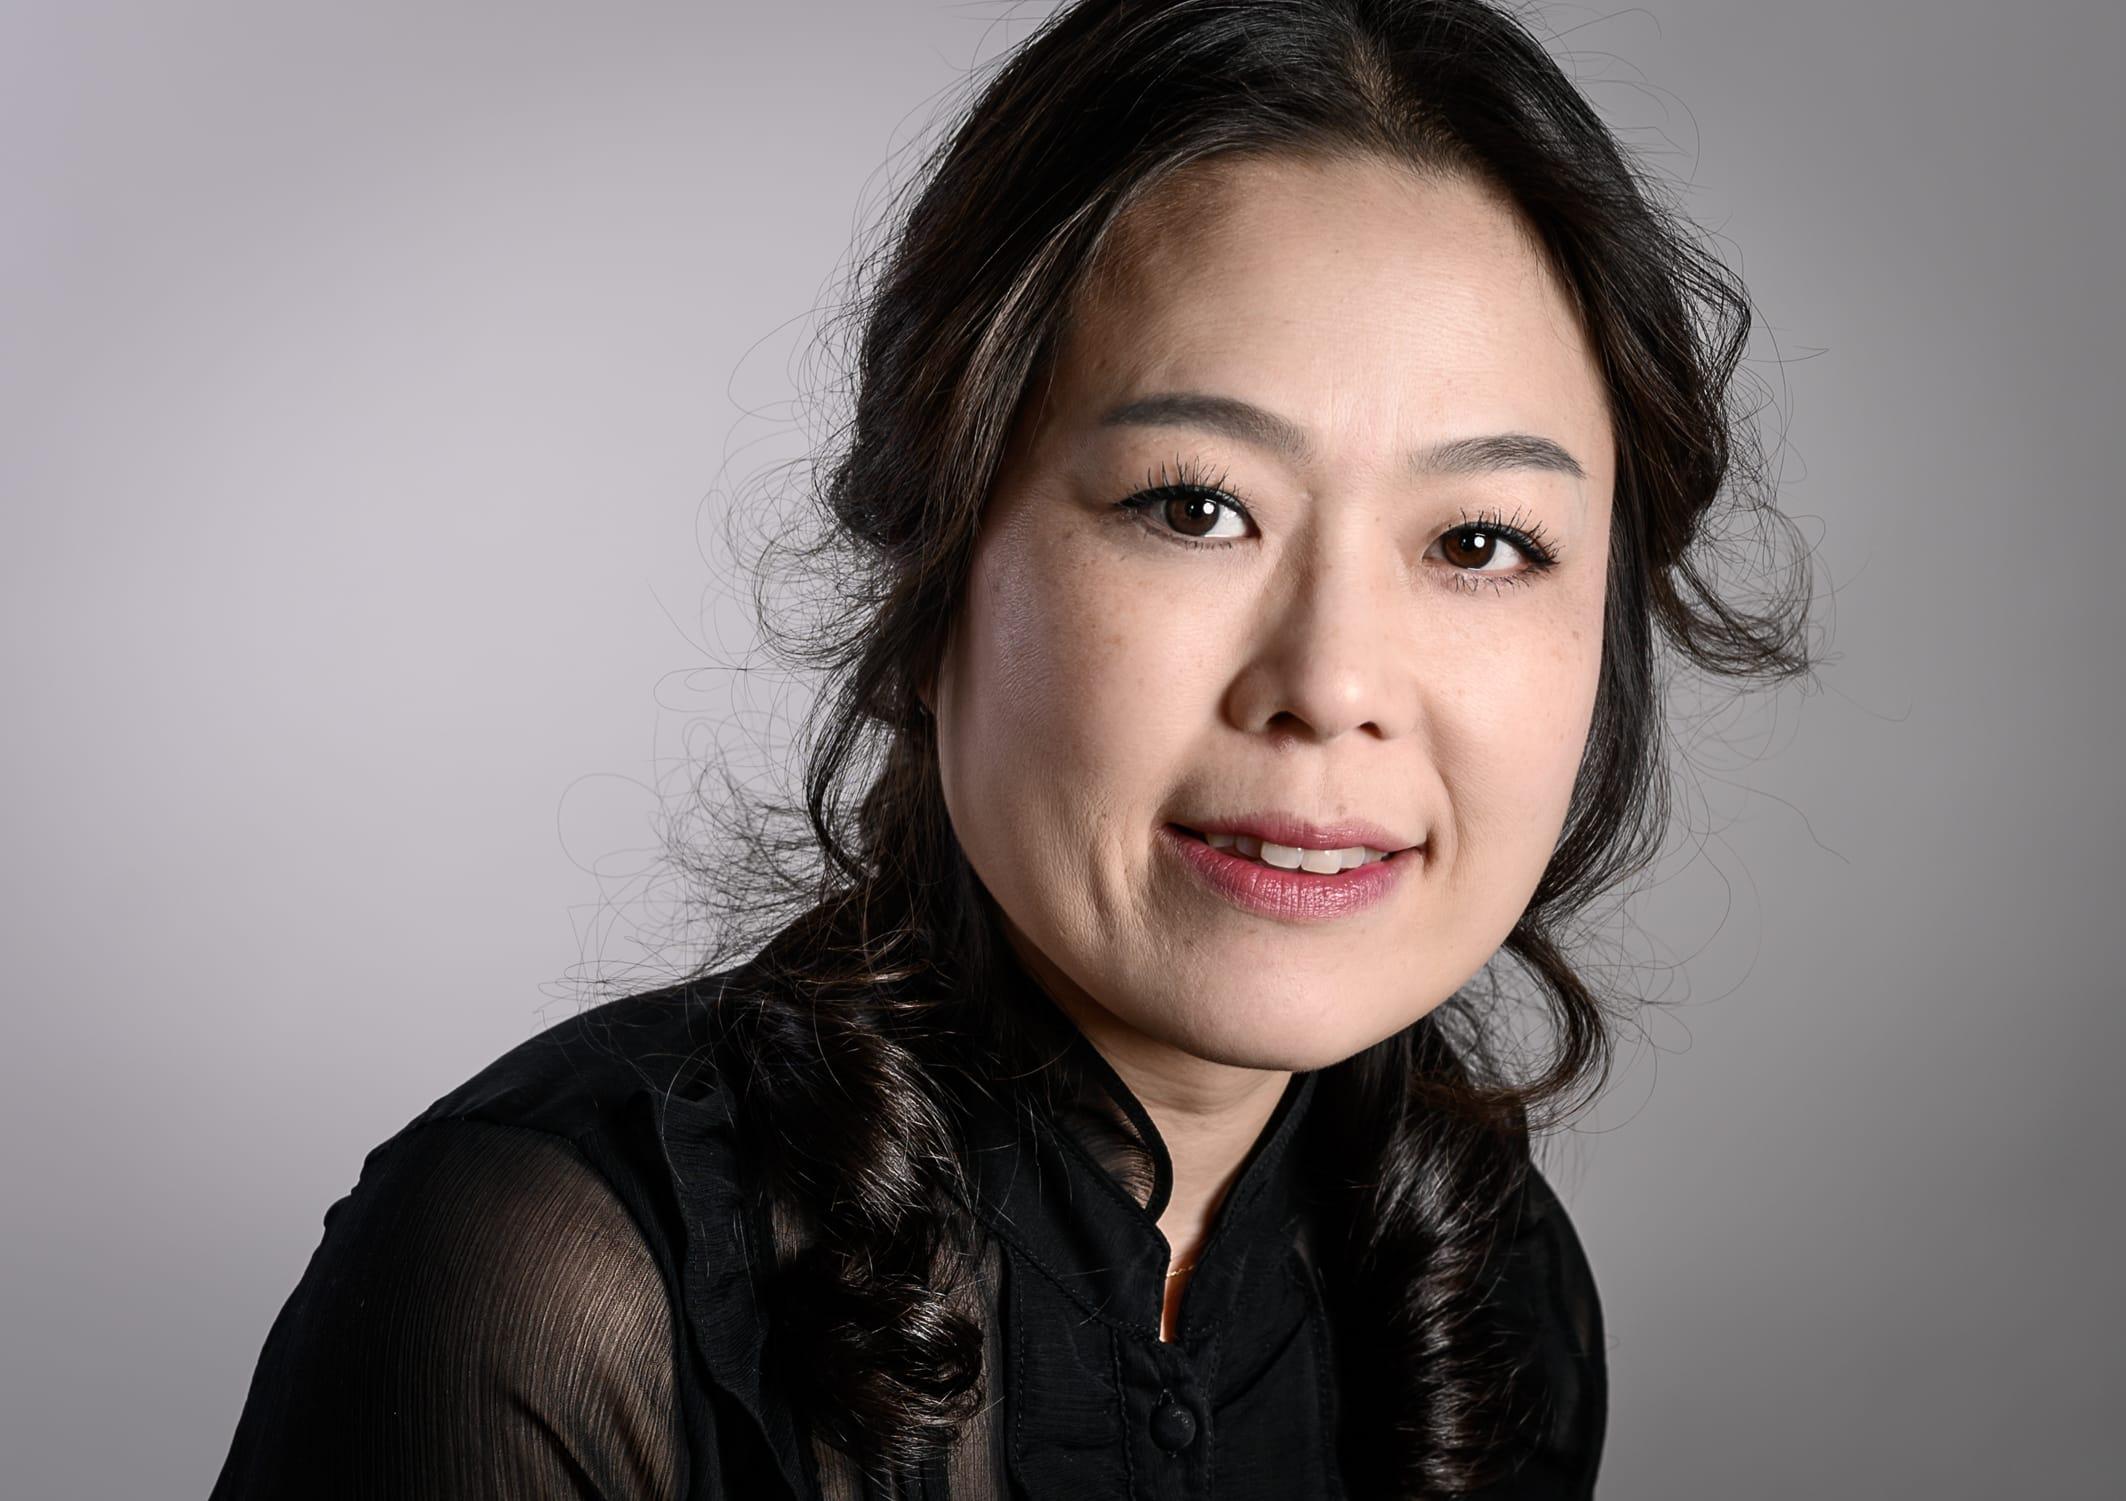 portrait Foto von Hyun-Kyung Kang